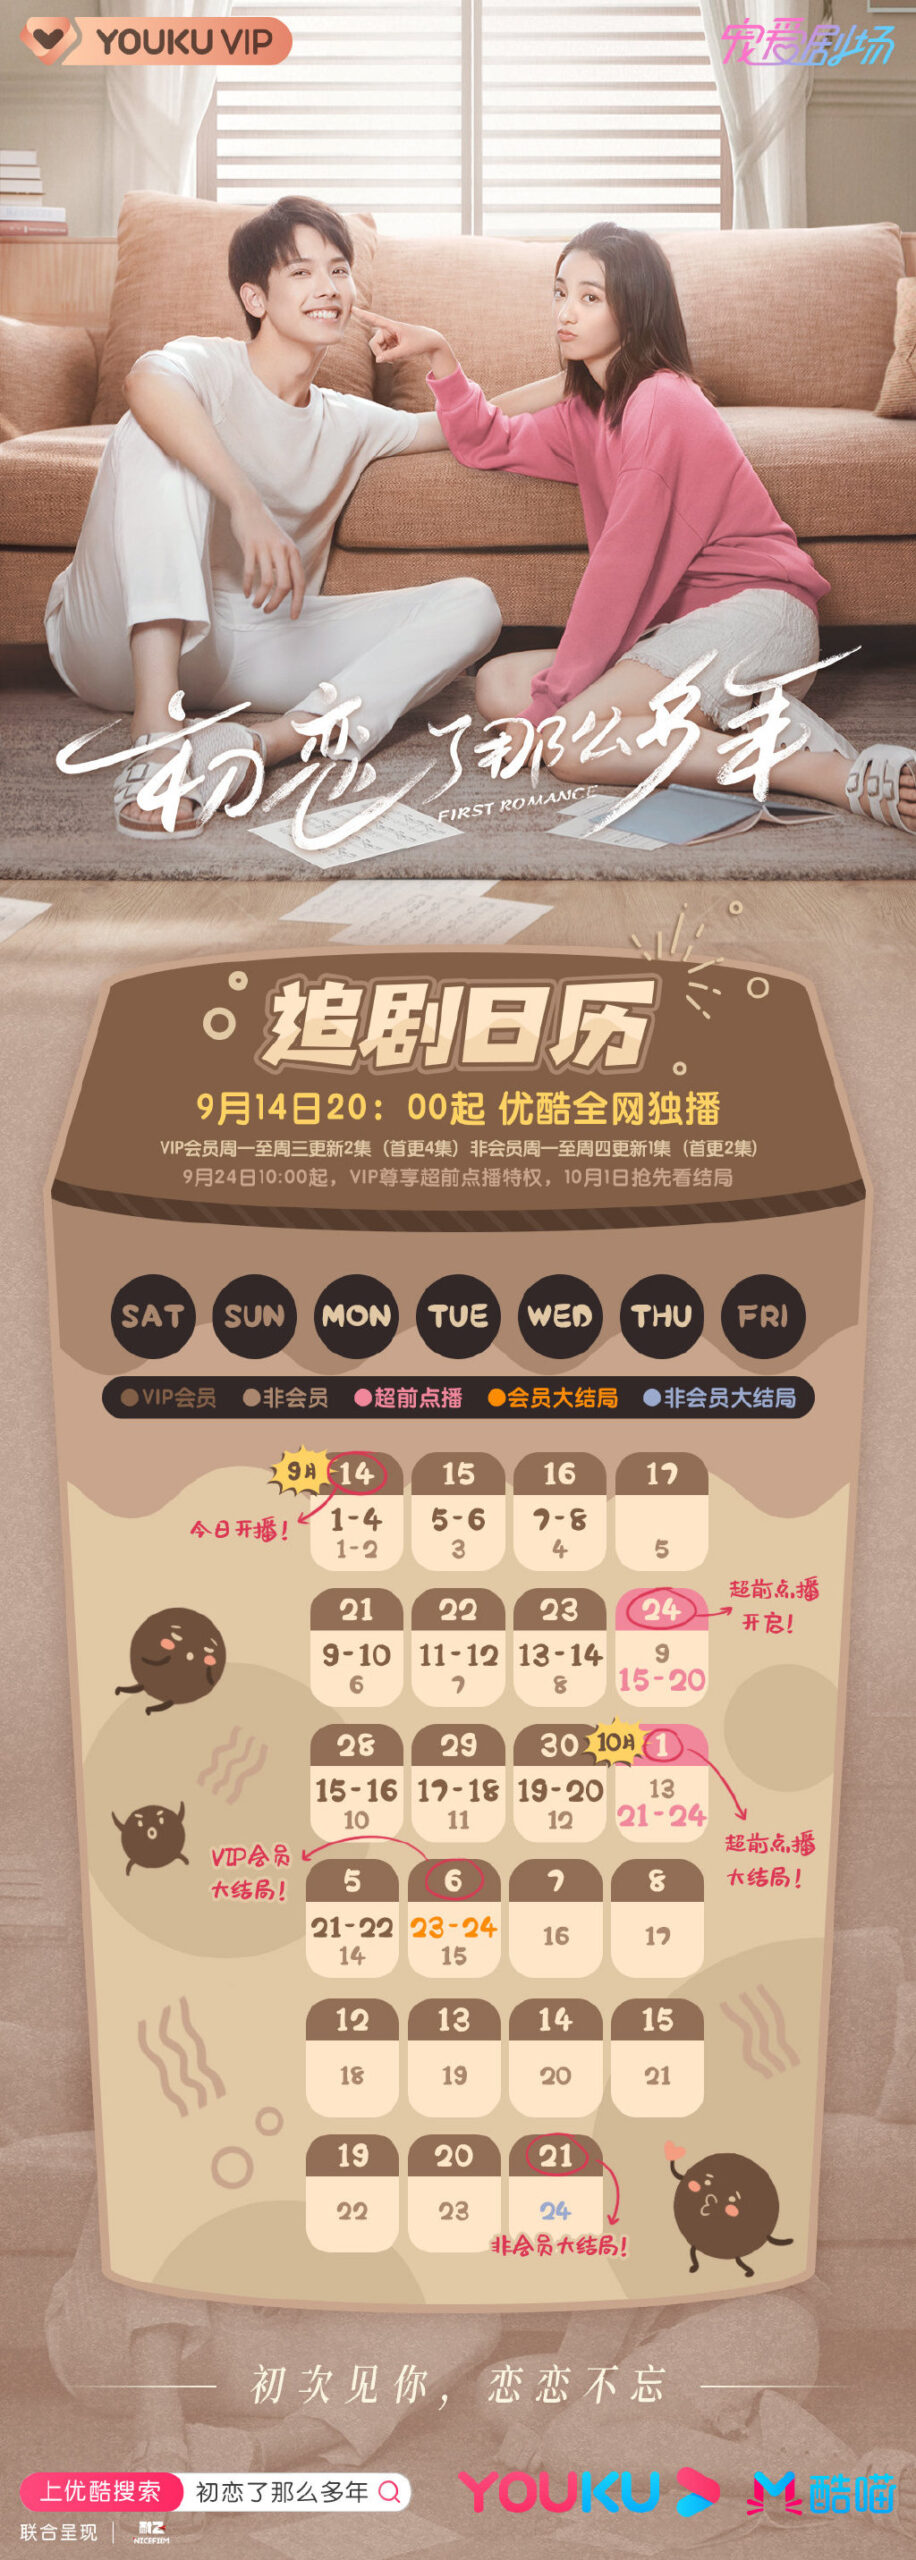 First Romance Chinese Drama Airing Calendar